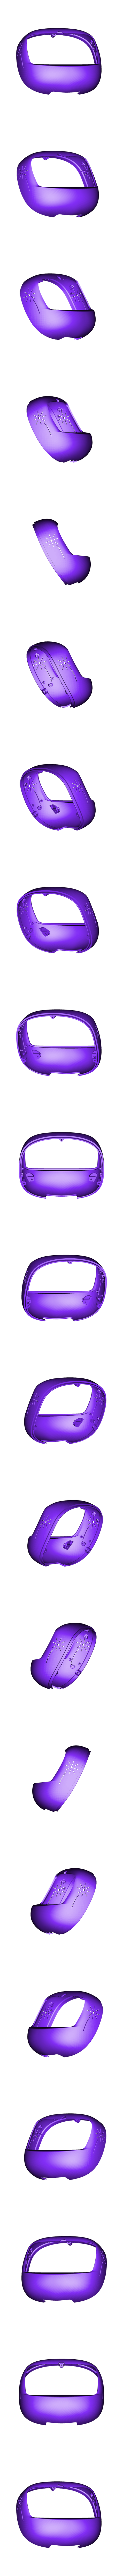 head_face.STL Download free STL file Poppy Torso • 3D printable model, PoppyProject